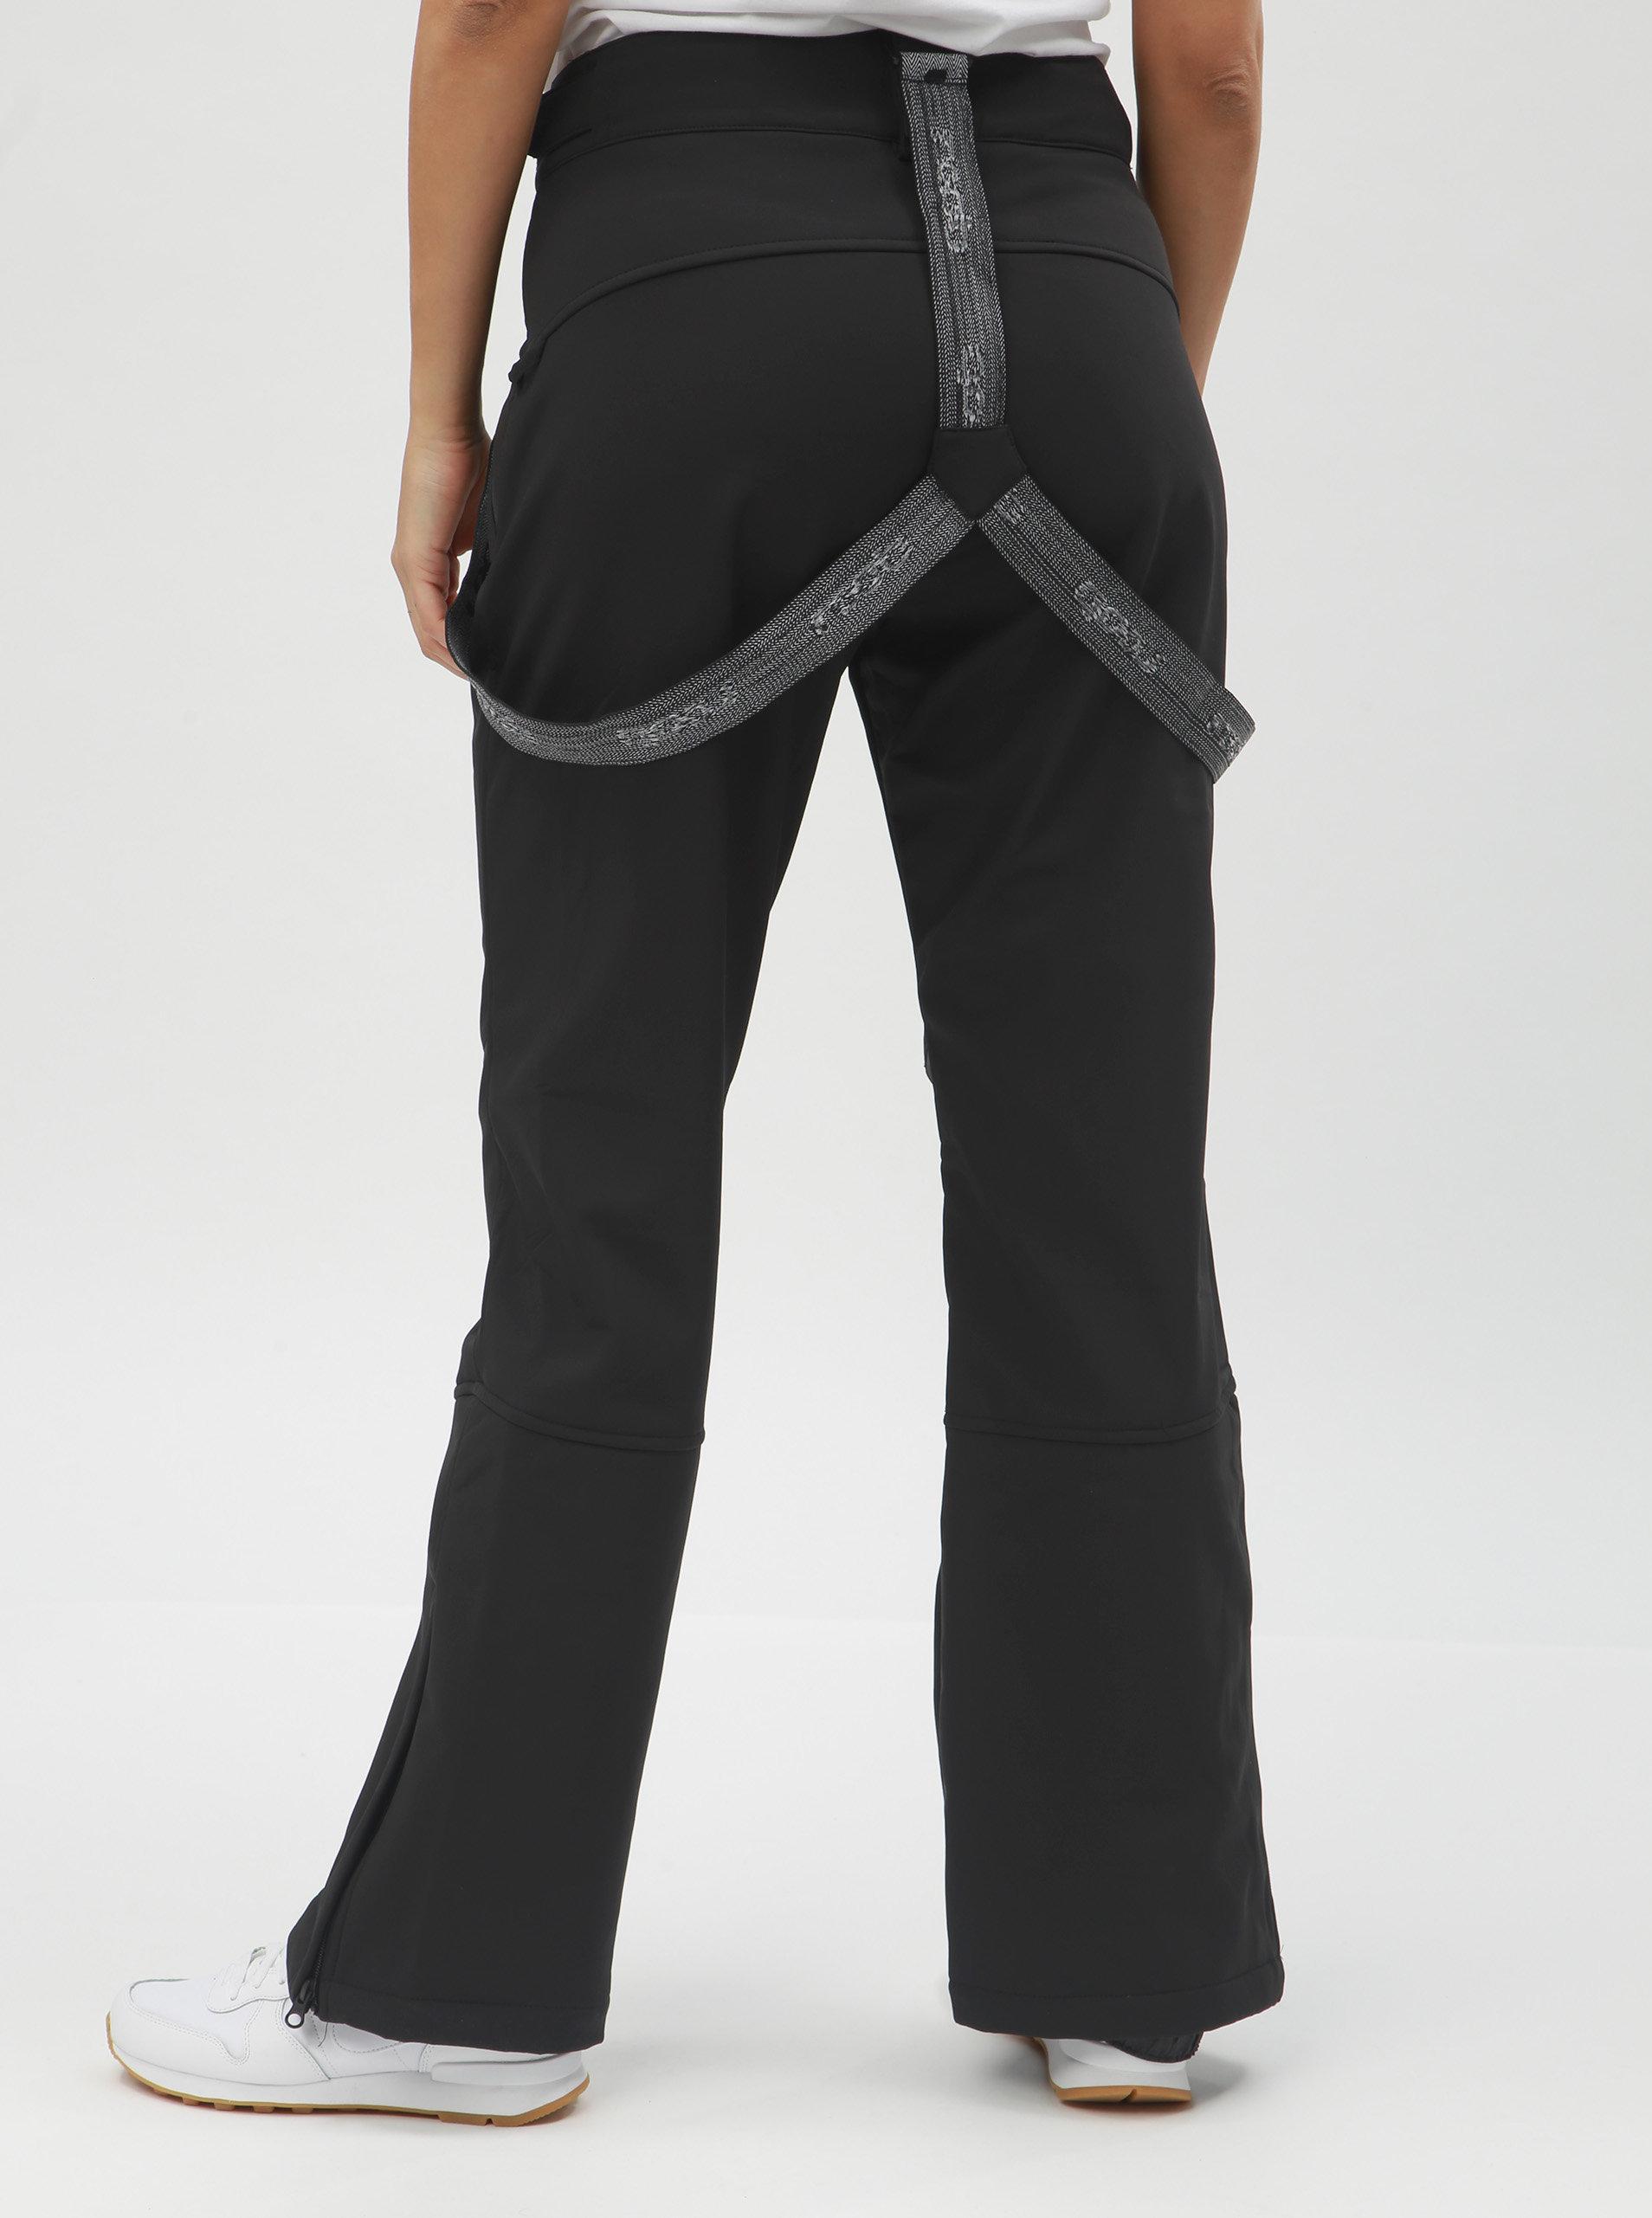 7146138dee1b3 Čierne dámske softshellové otepľovačky LOAP Lizzy | ZOOT.sk